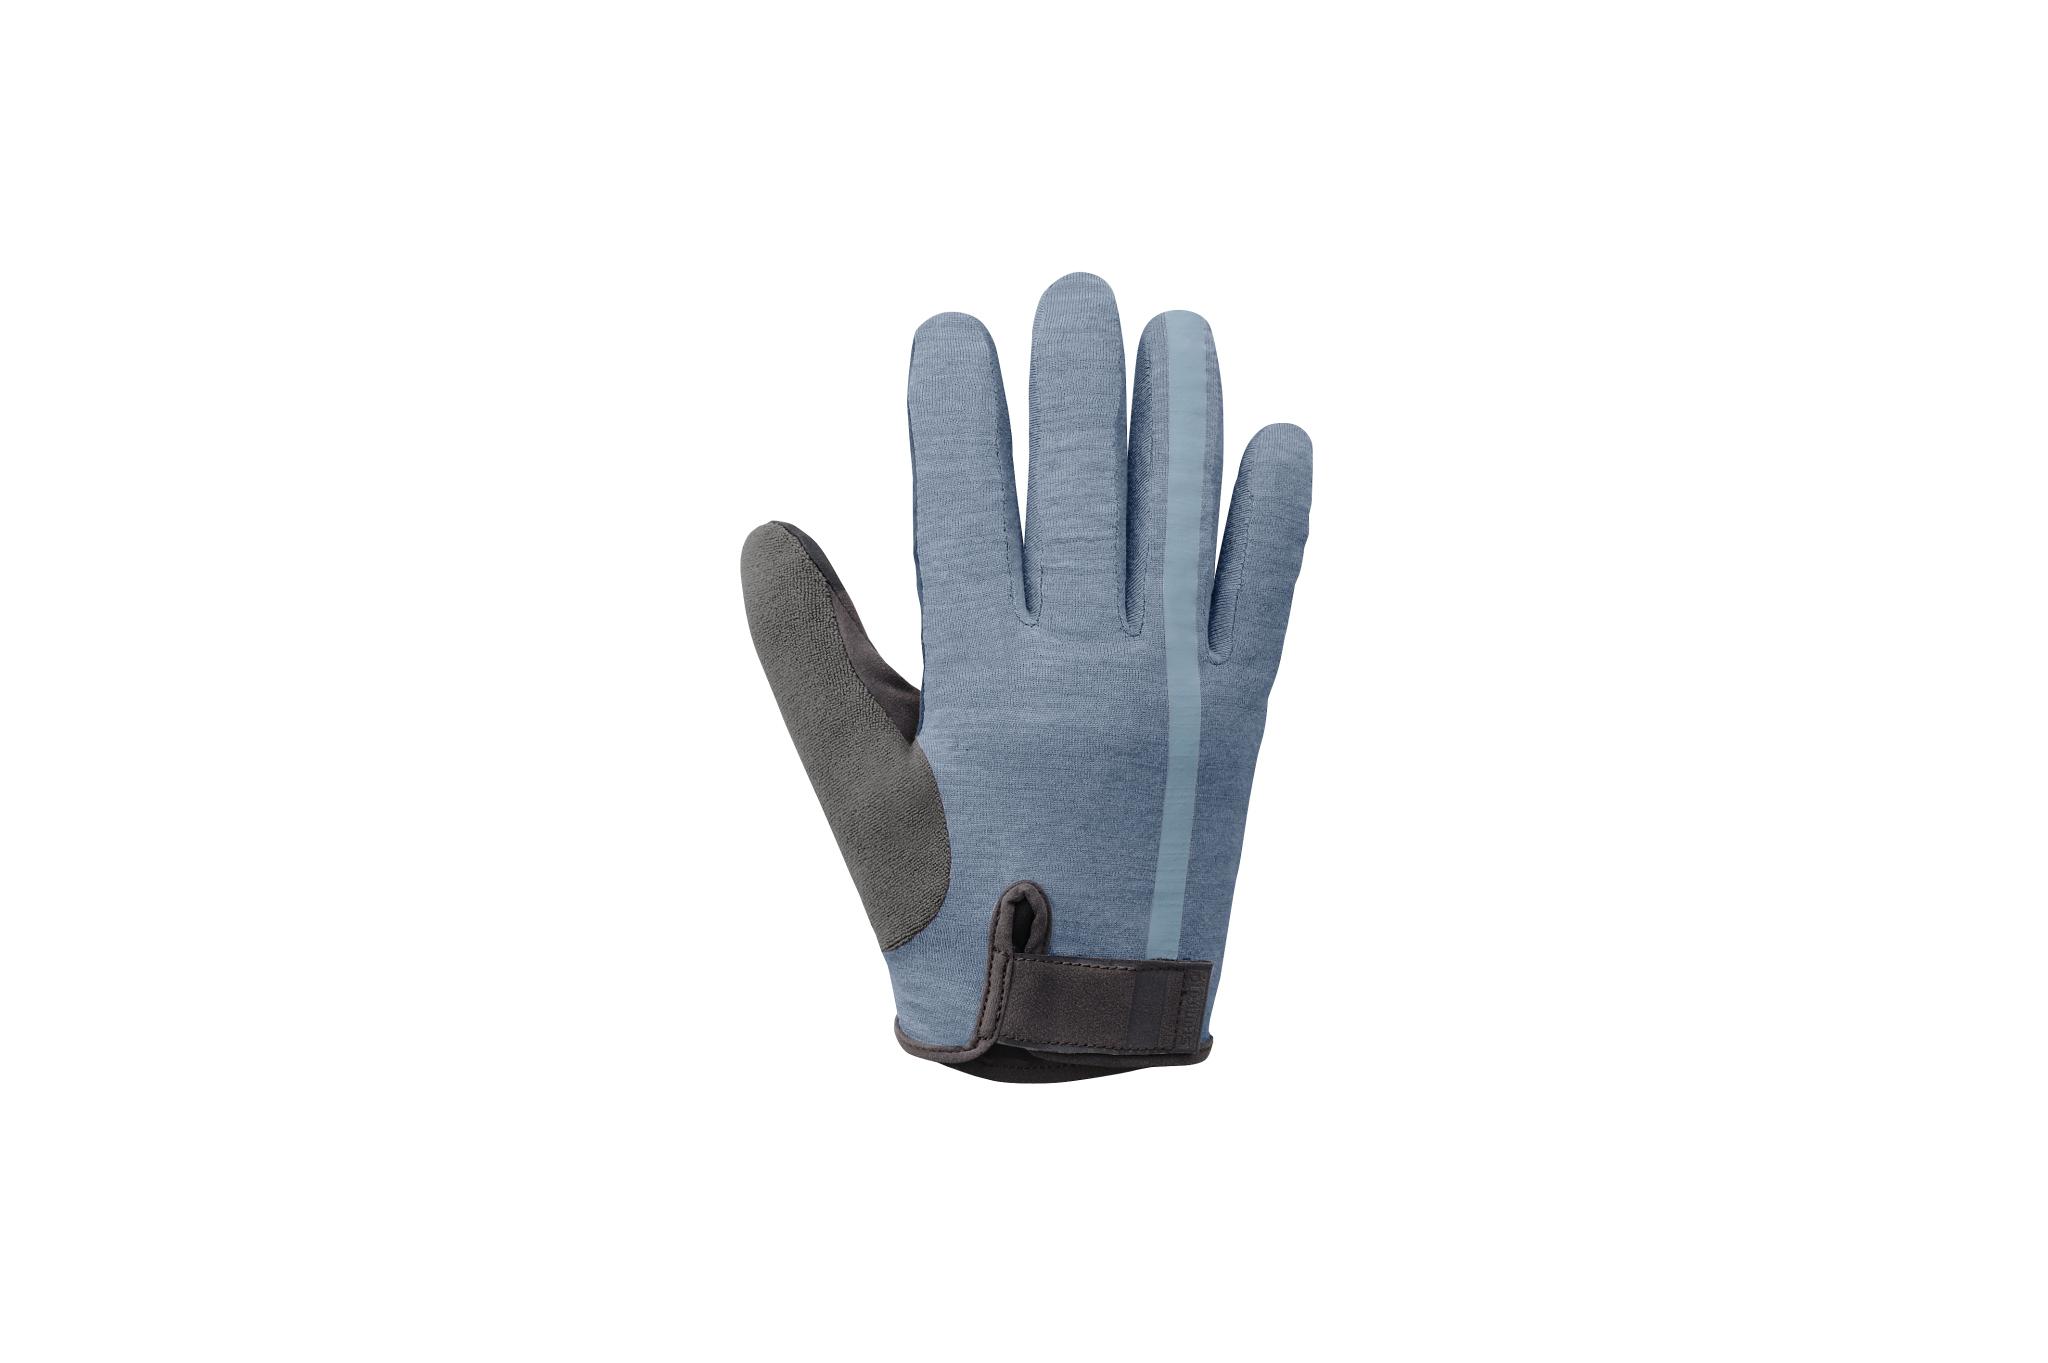 Shimano Transit Short Finger Men/'s Bike Gloves Aegean Blue New Large